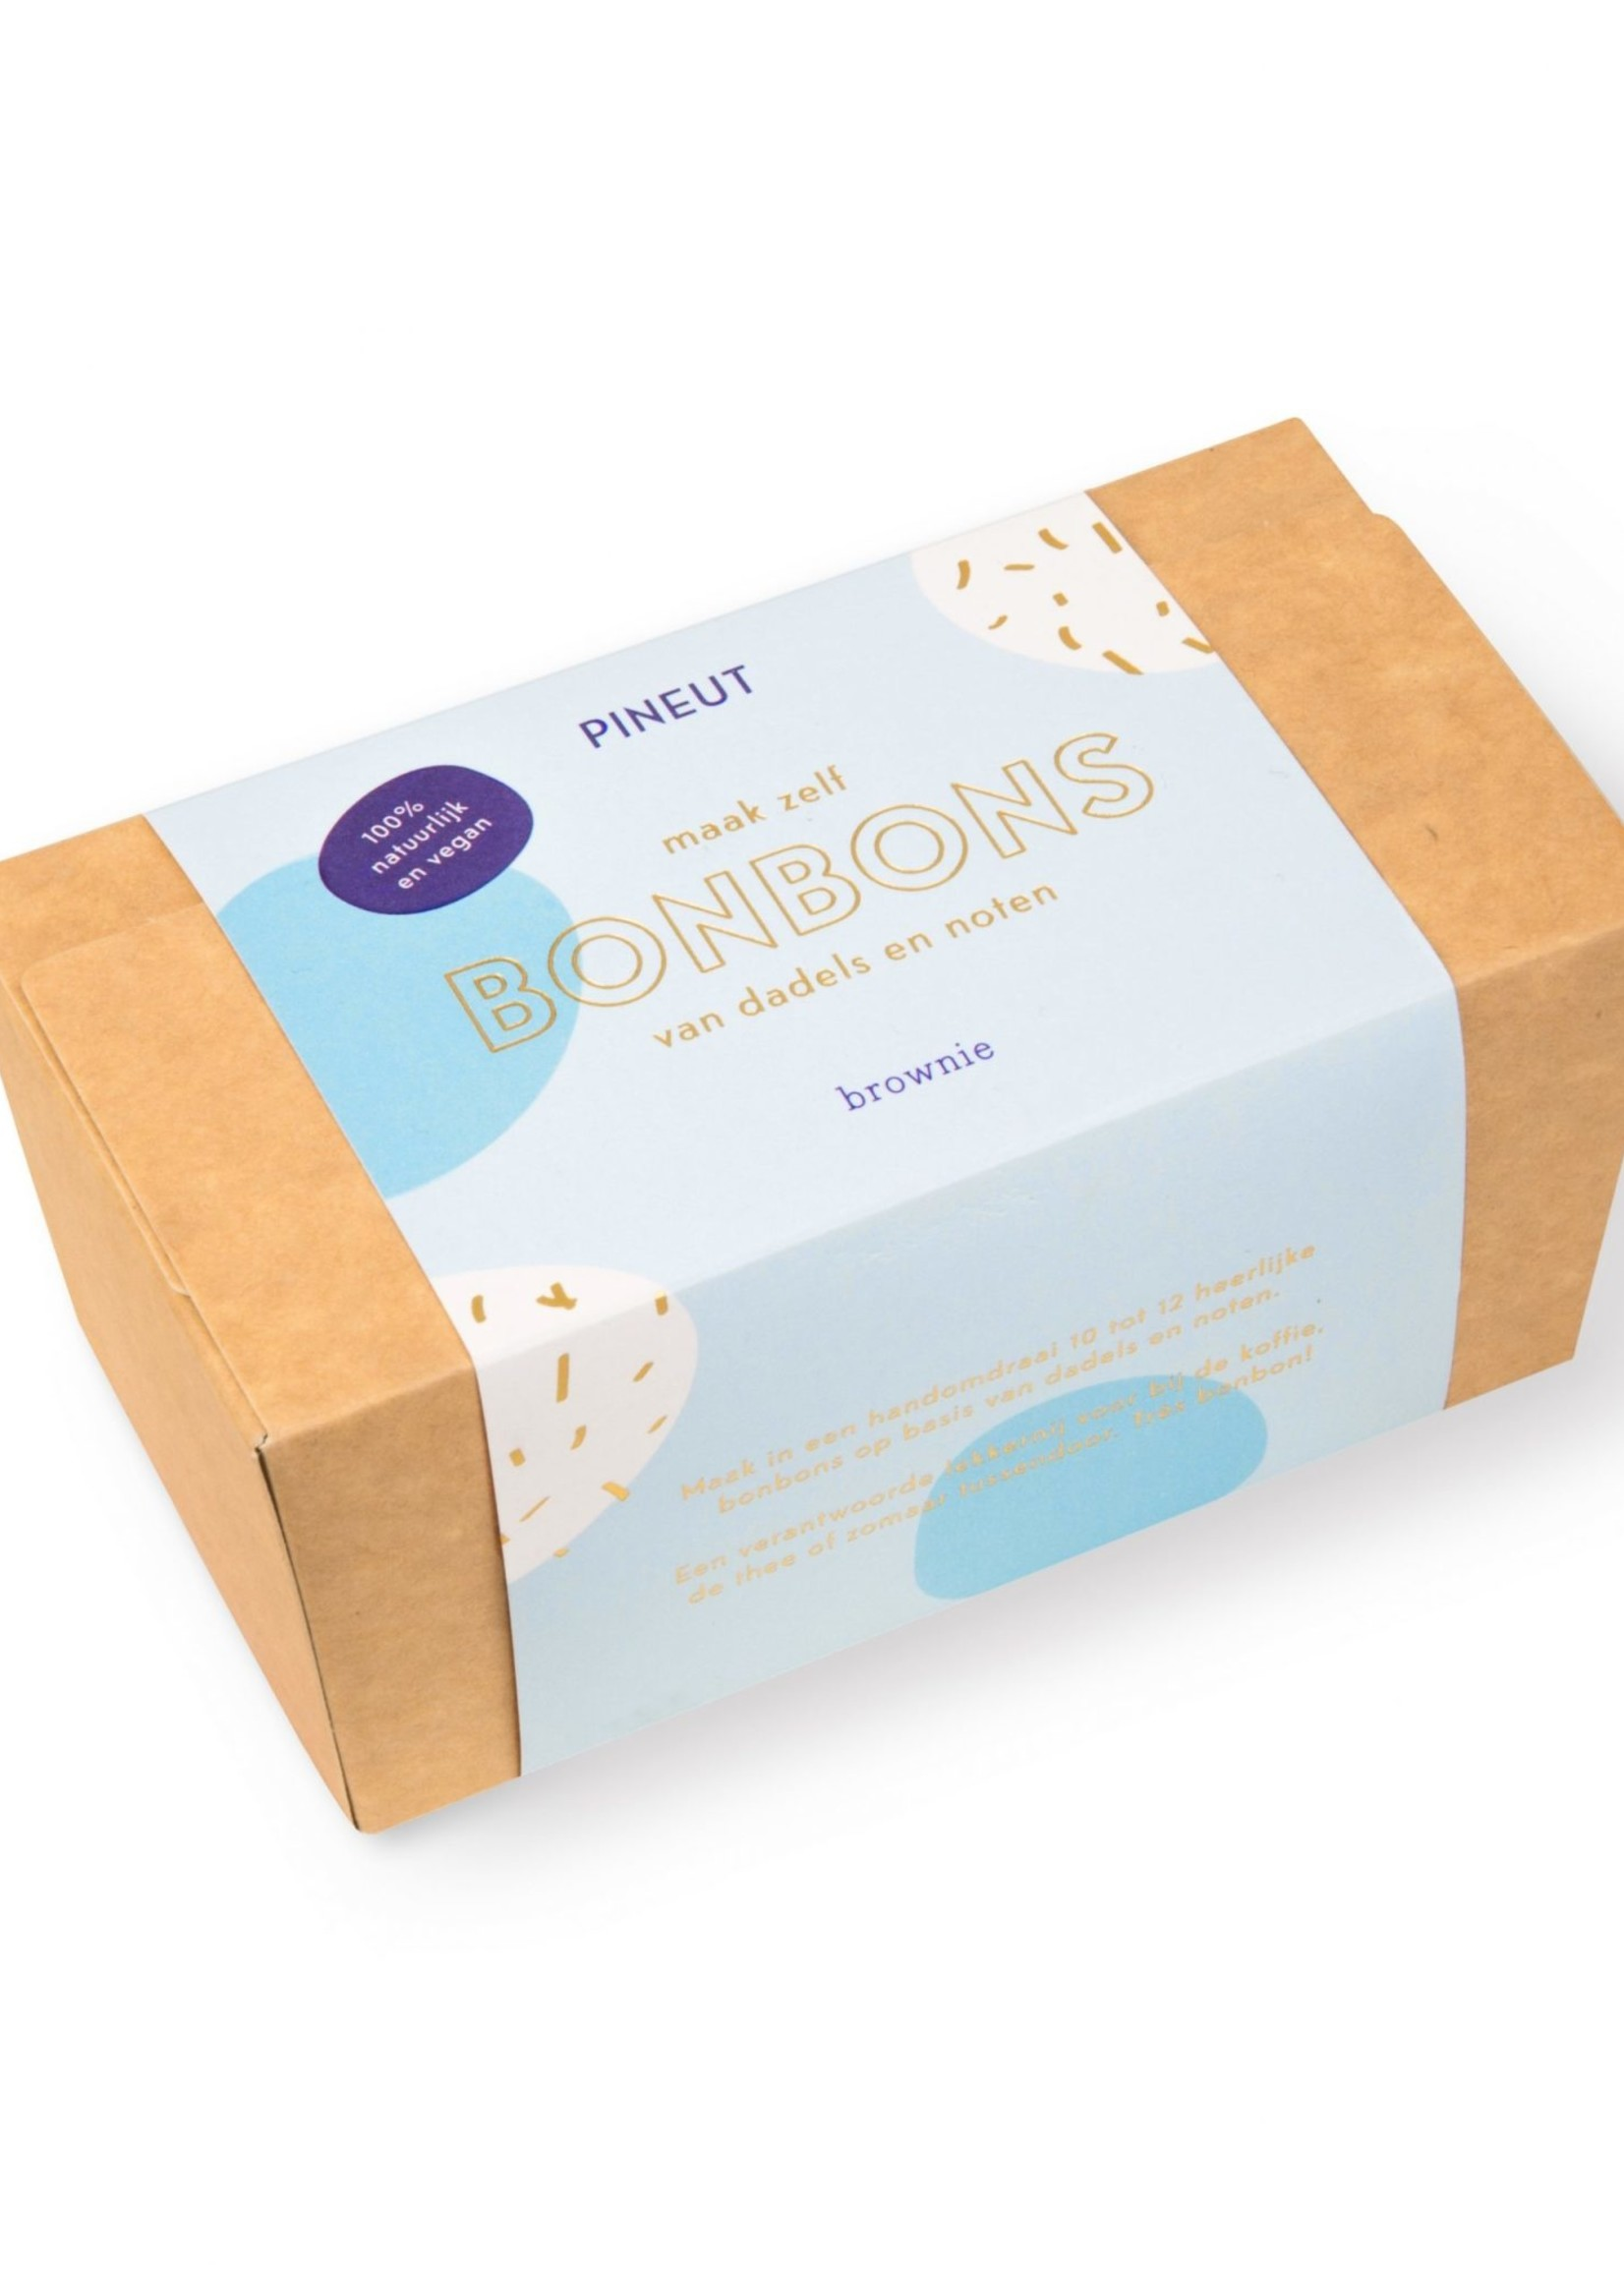 Pineut Pineut - Bonbons - Brownie Kokos